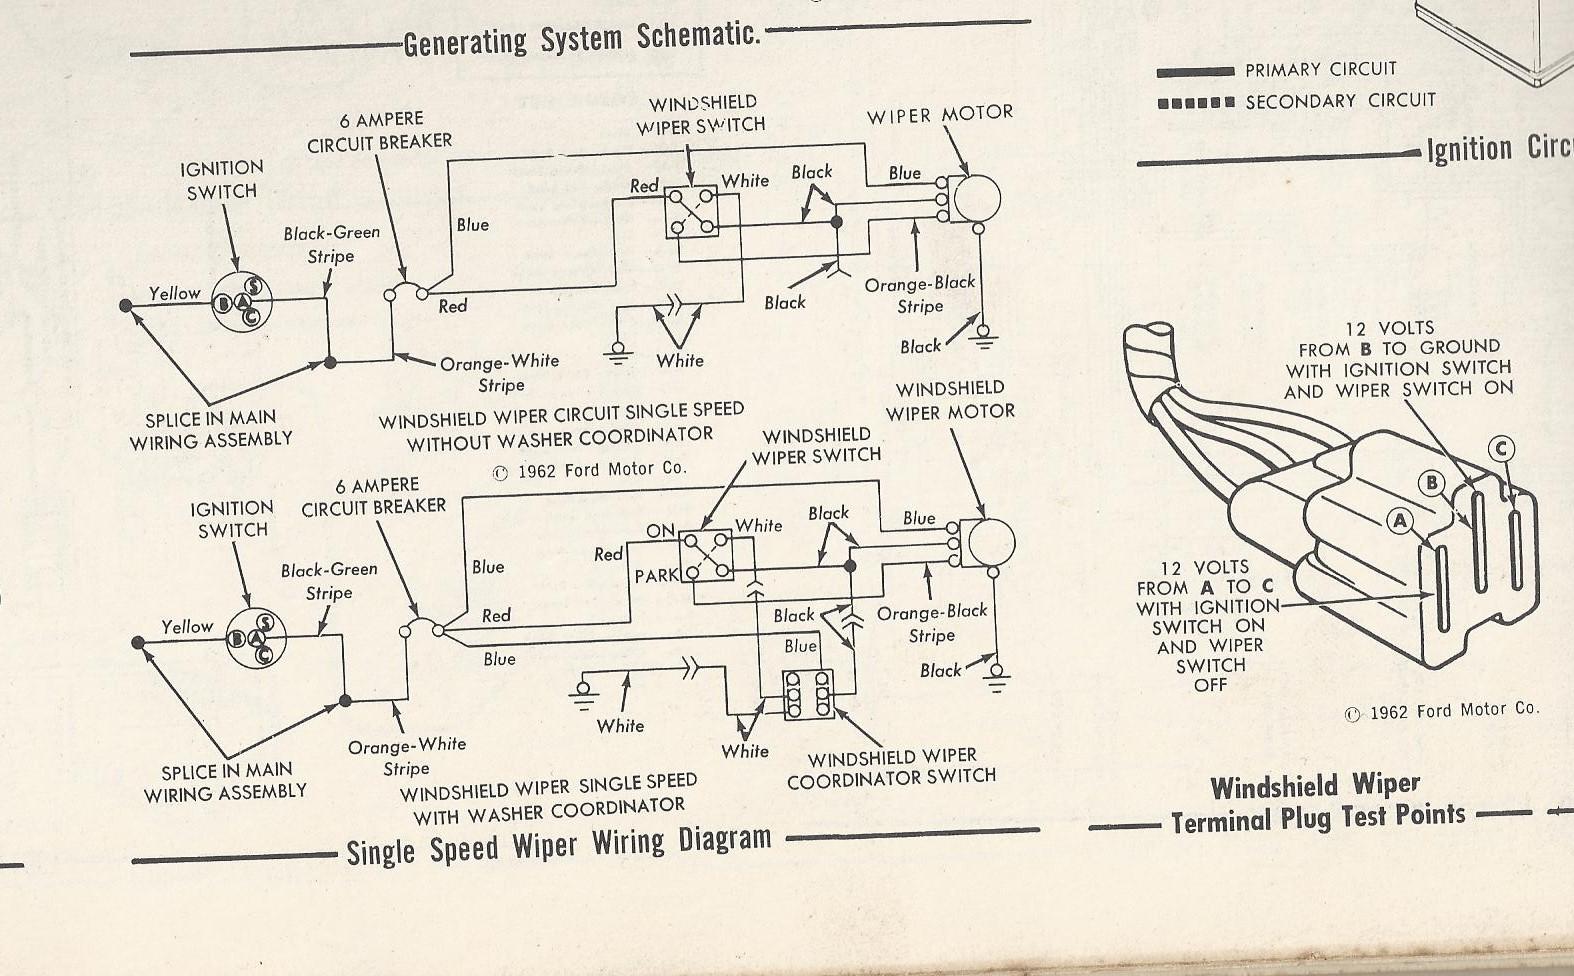 63 Falcon wiper motor wiring | The H.A.M.B.